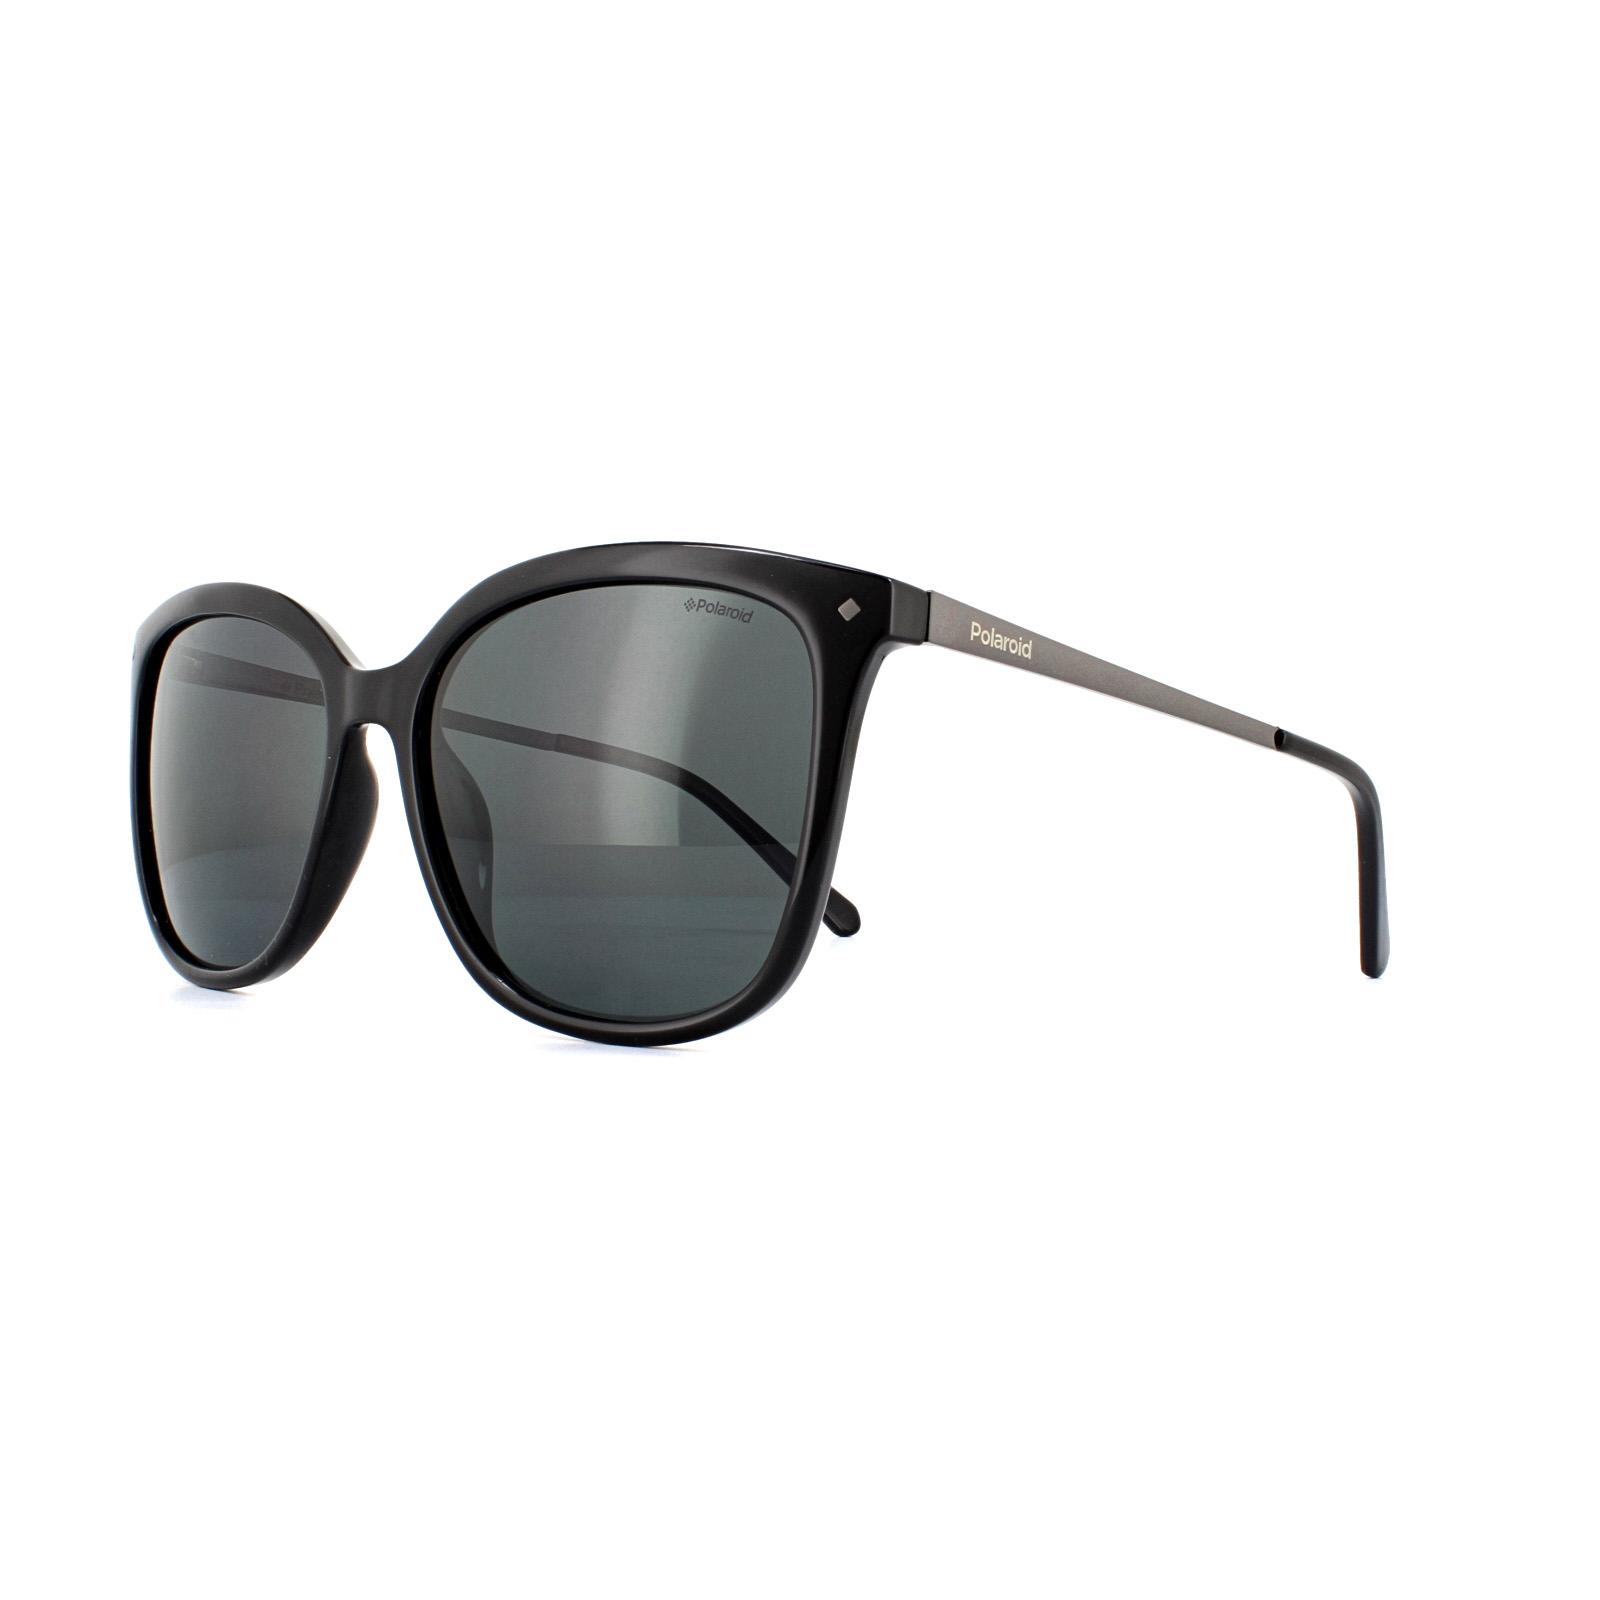 Polaroid Sunglasses PLD 4043//S CVS Y2 Black Grey Polarized